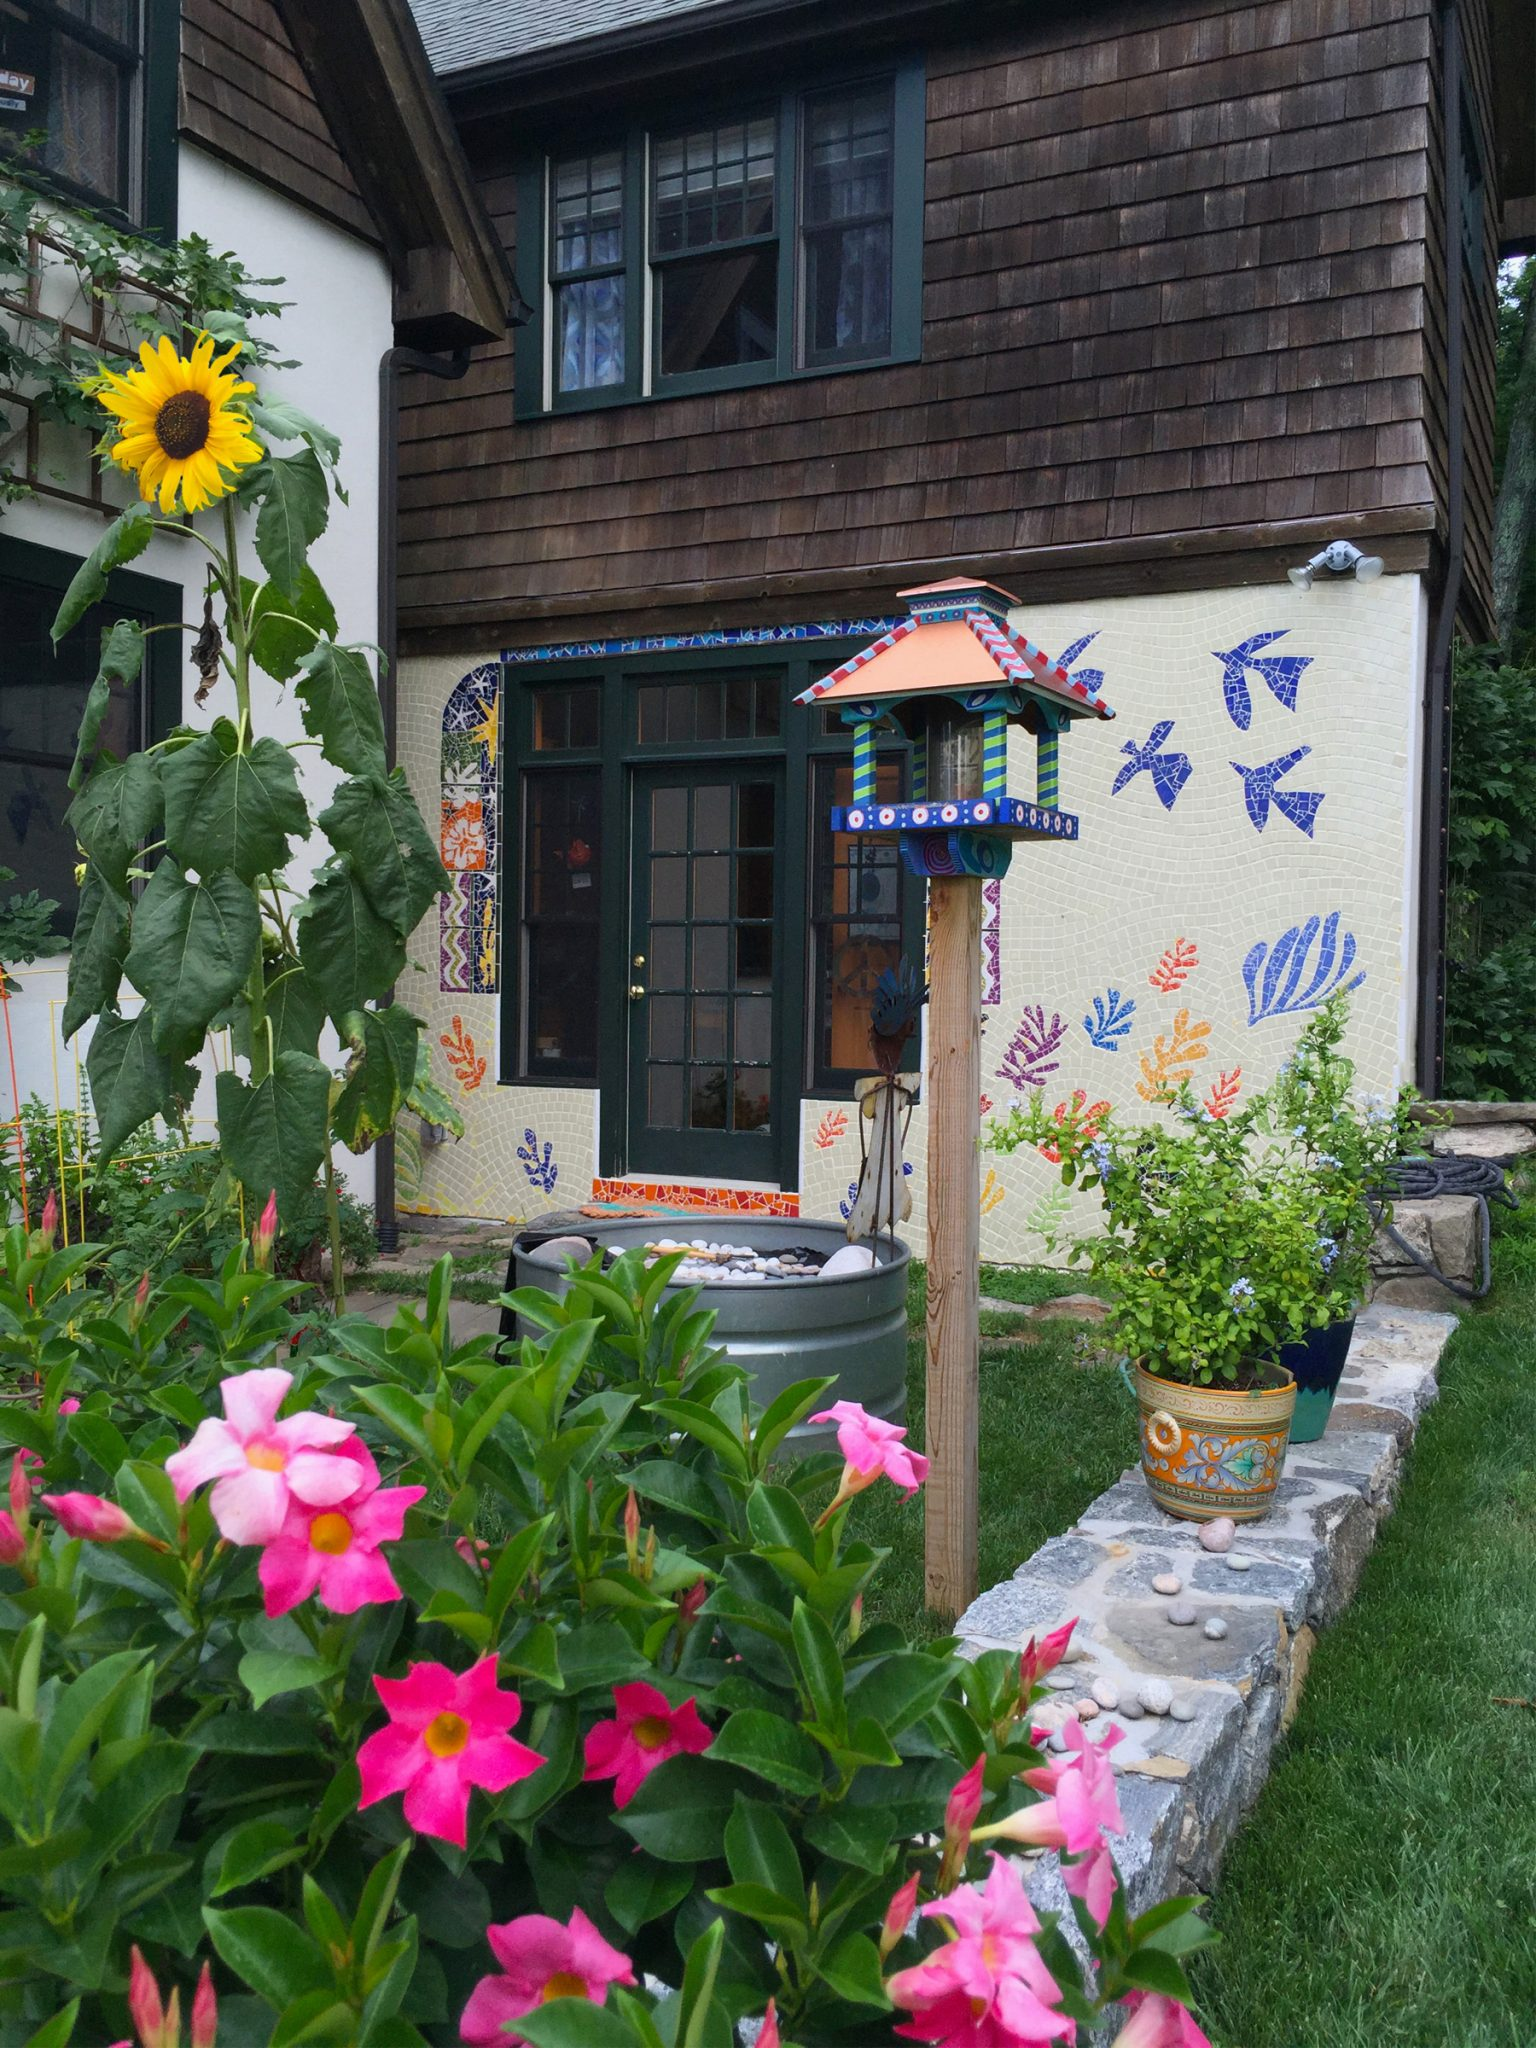 Matisse-inspired-garden-wall-1